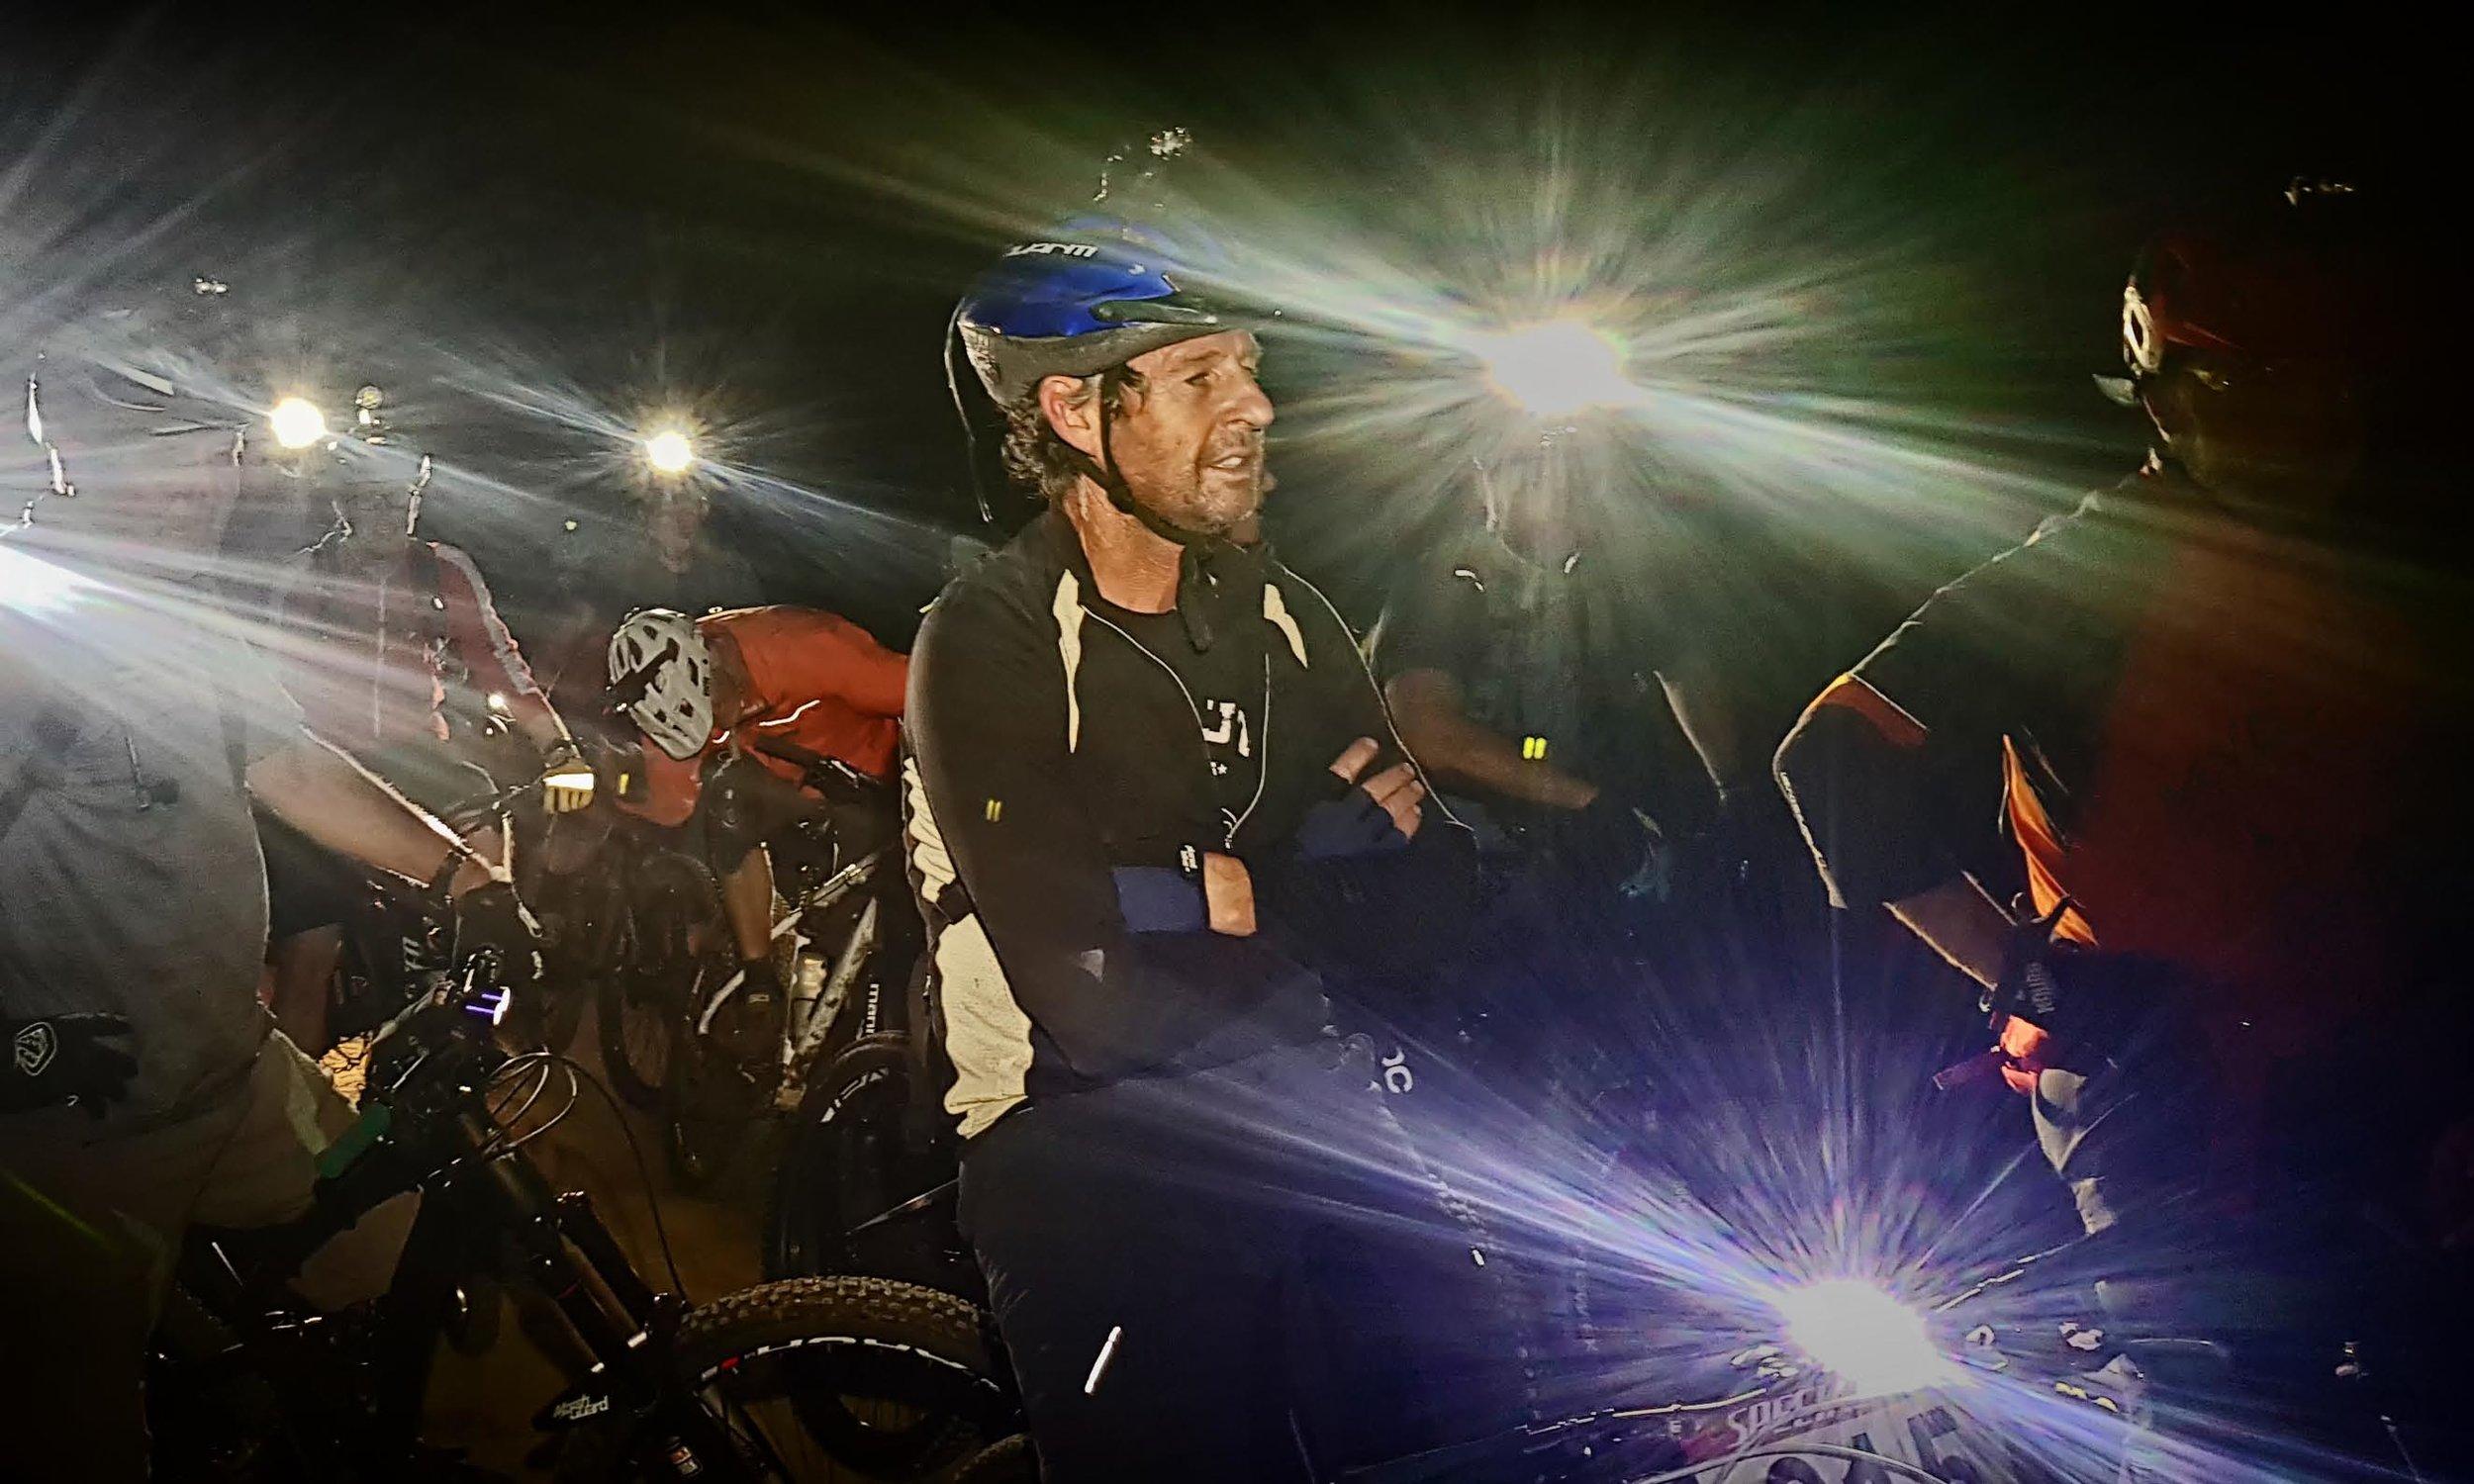 Benelong club riders on night ride at Gum Tree Mountain  Bike Park